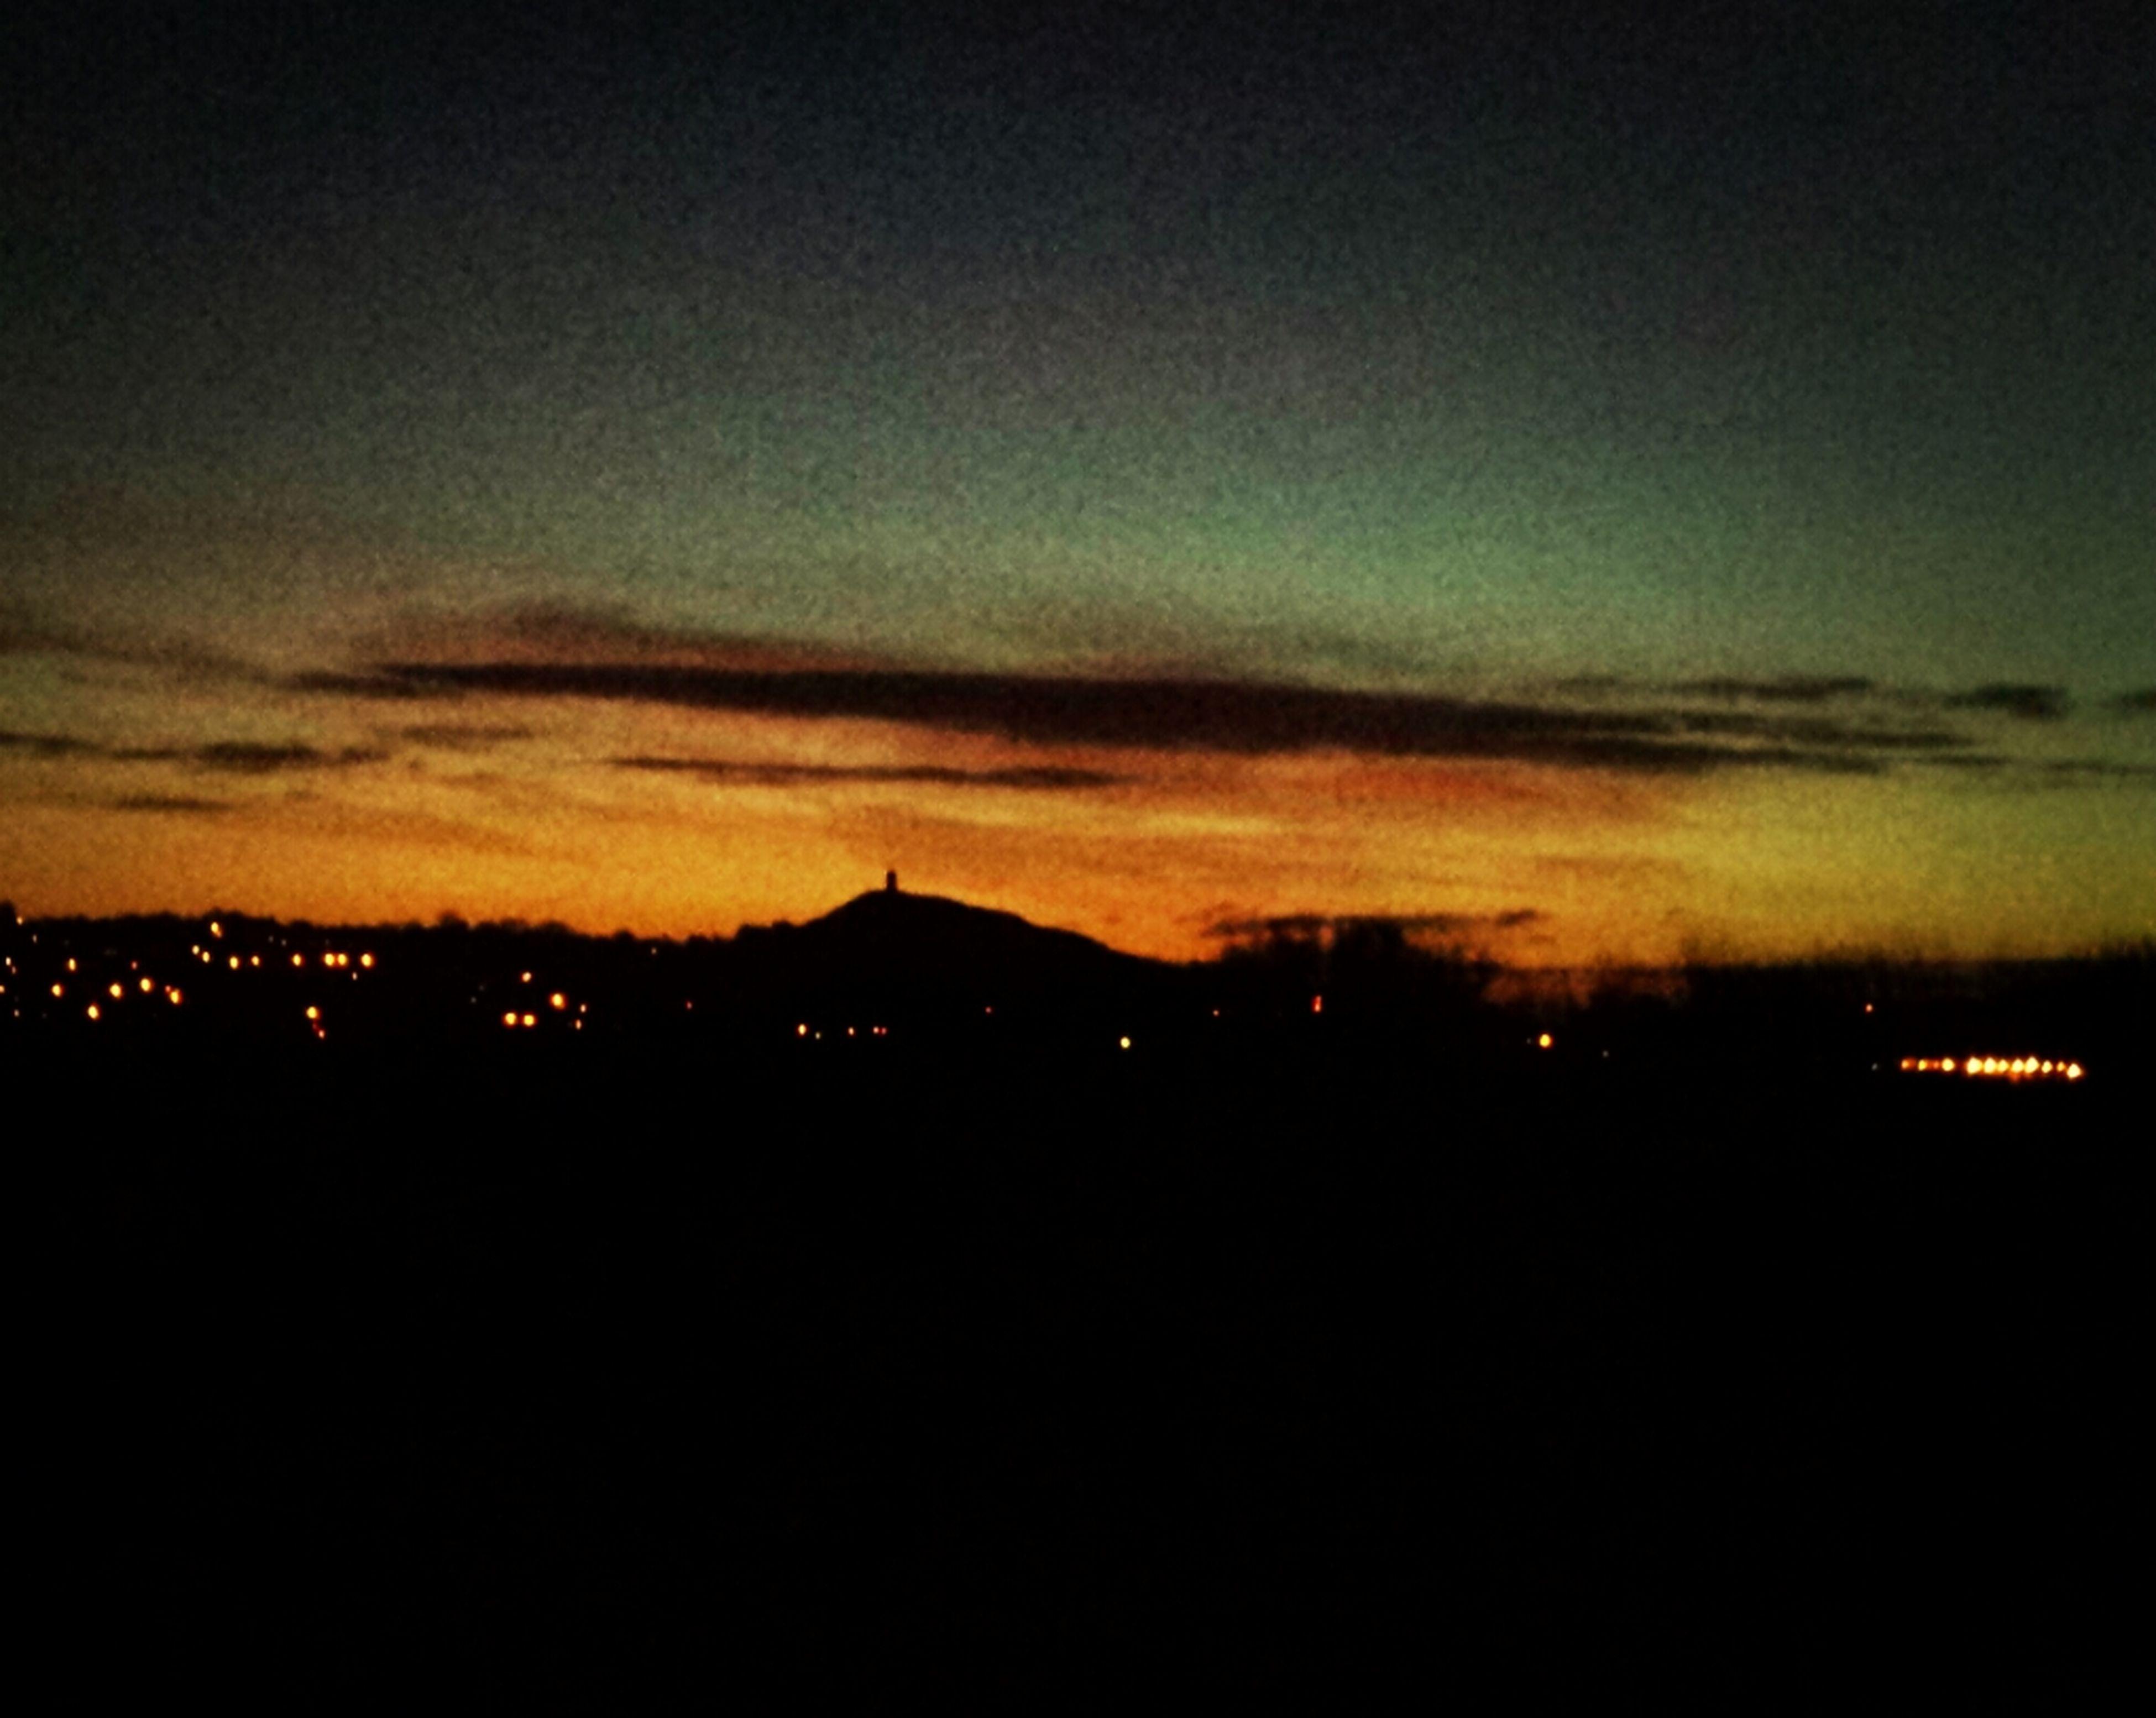 sunset, silhouette, illuminated, sky, building exterior, built structure, scenics, night, dark, dusk, architecture, beauty in nature, landscape, cloud - sky, copy space, city, orange color, tranquil scene, dramatic sky, nature